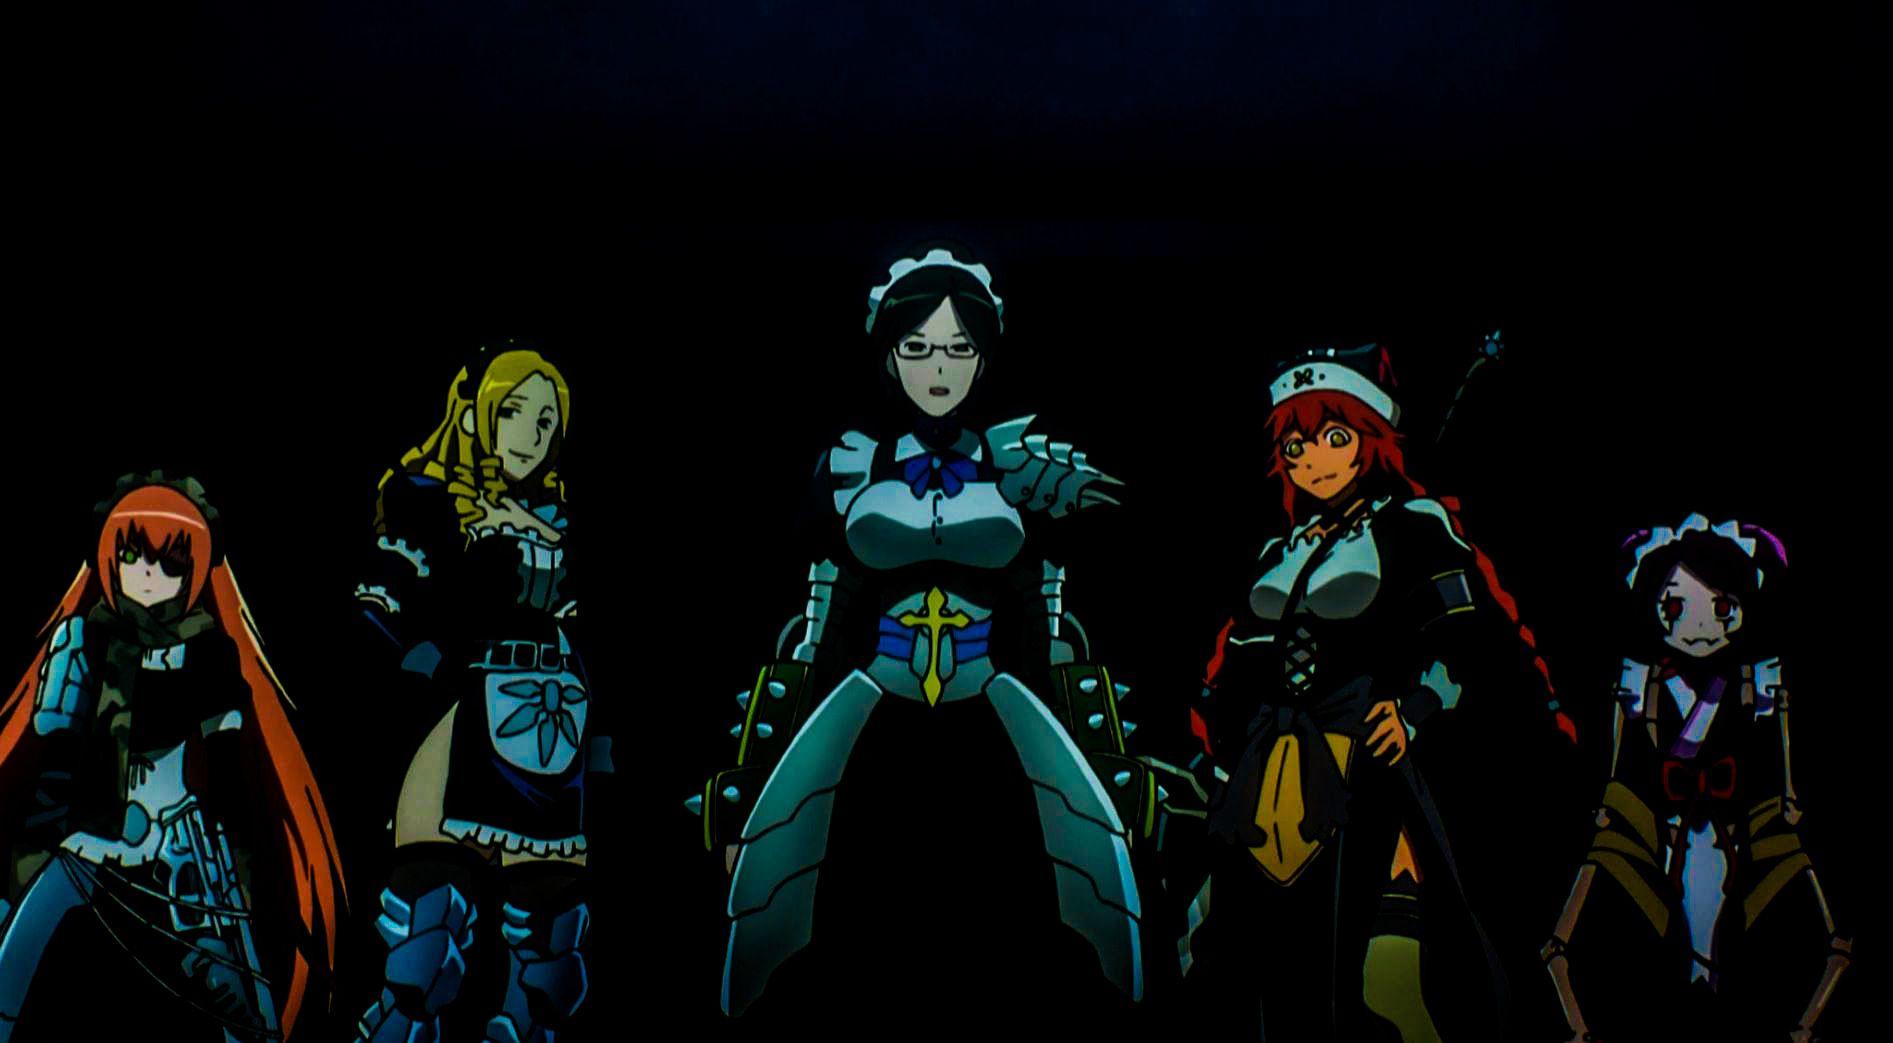 Pin by entviews on anime Greatest villains, Anime